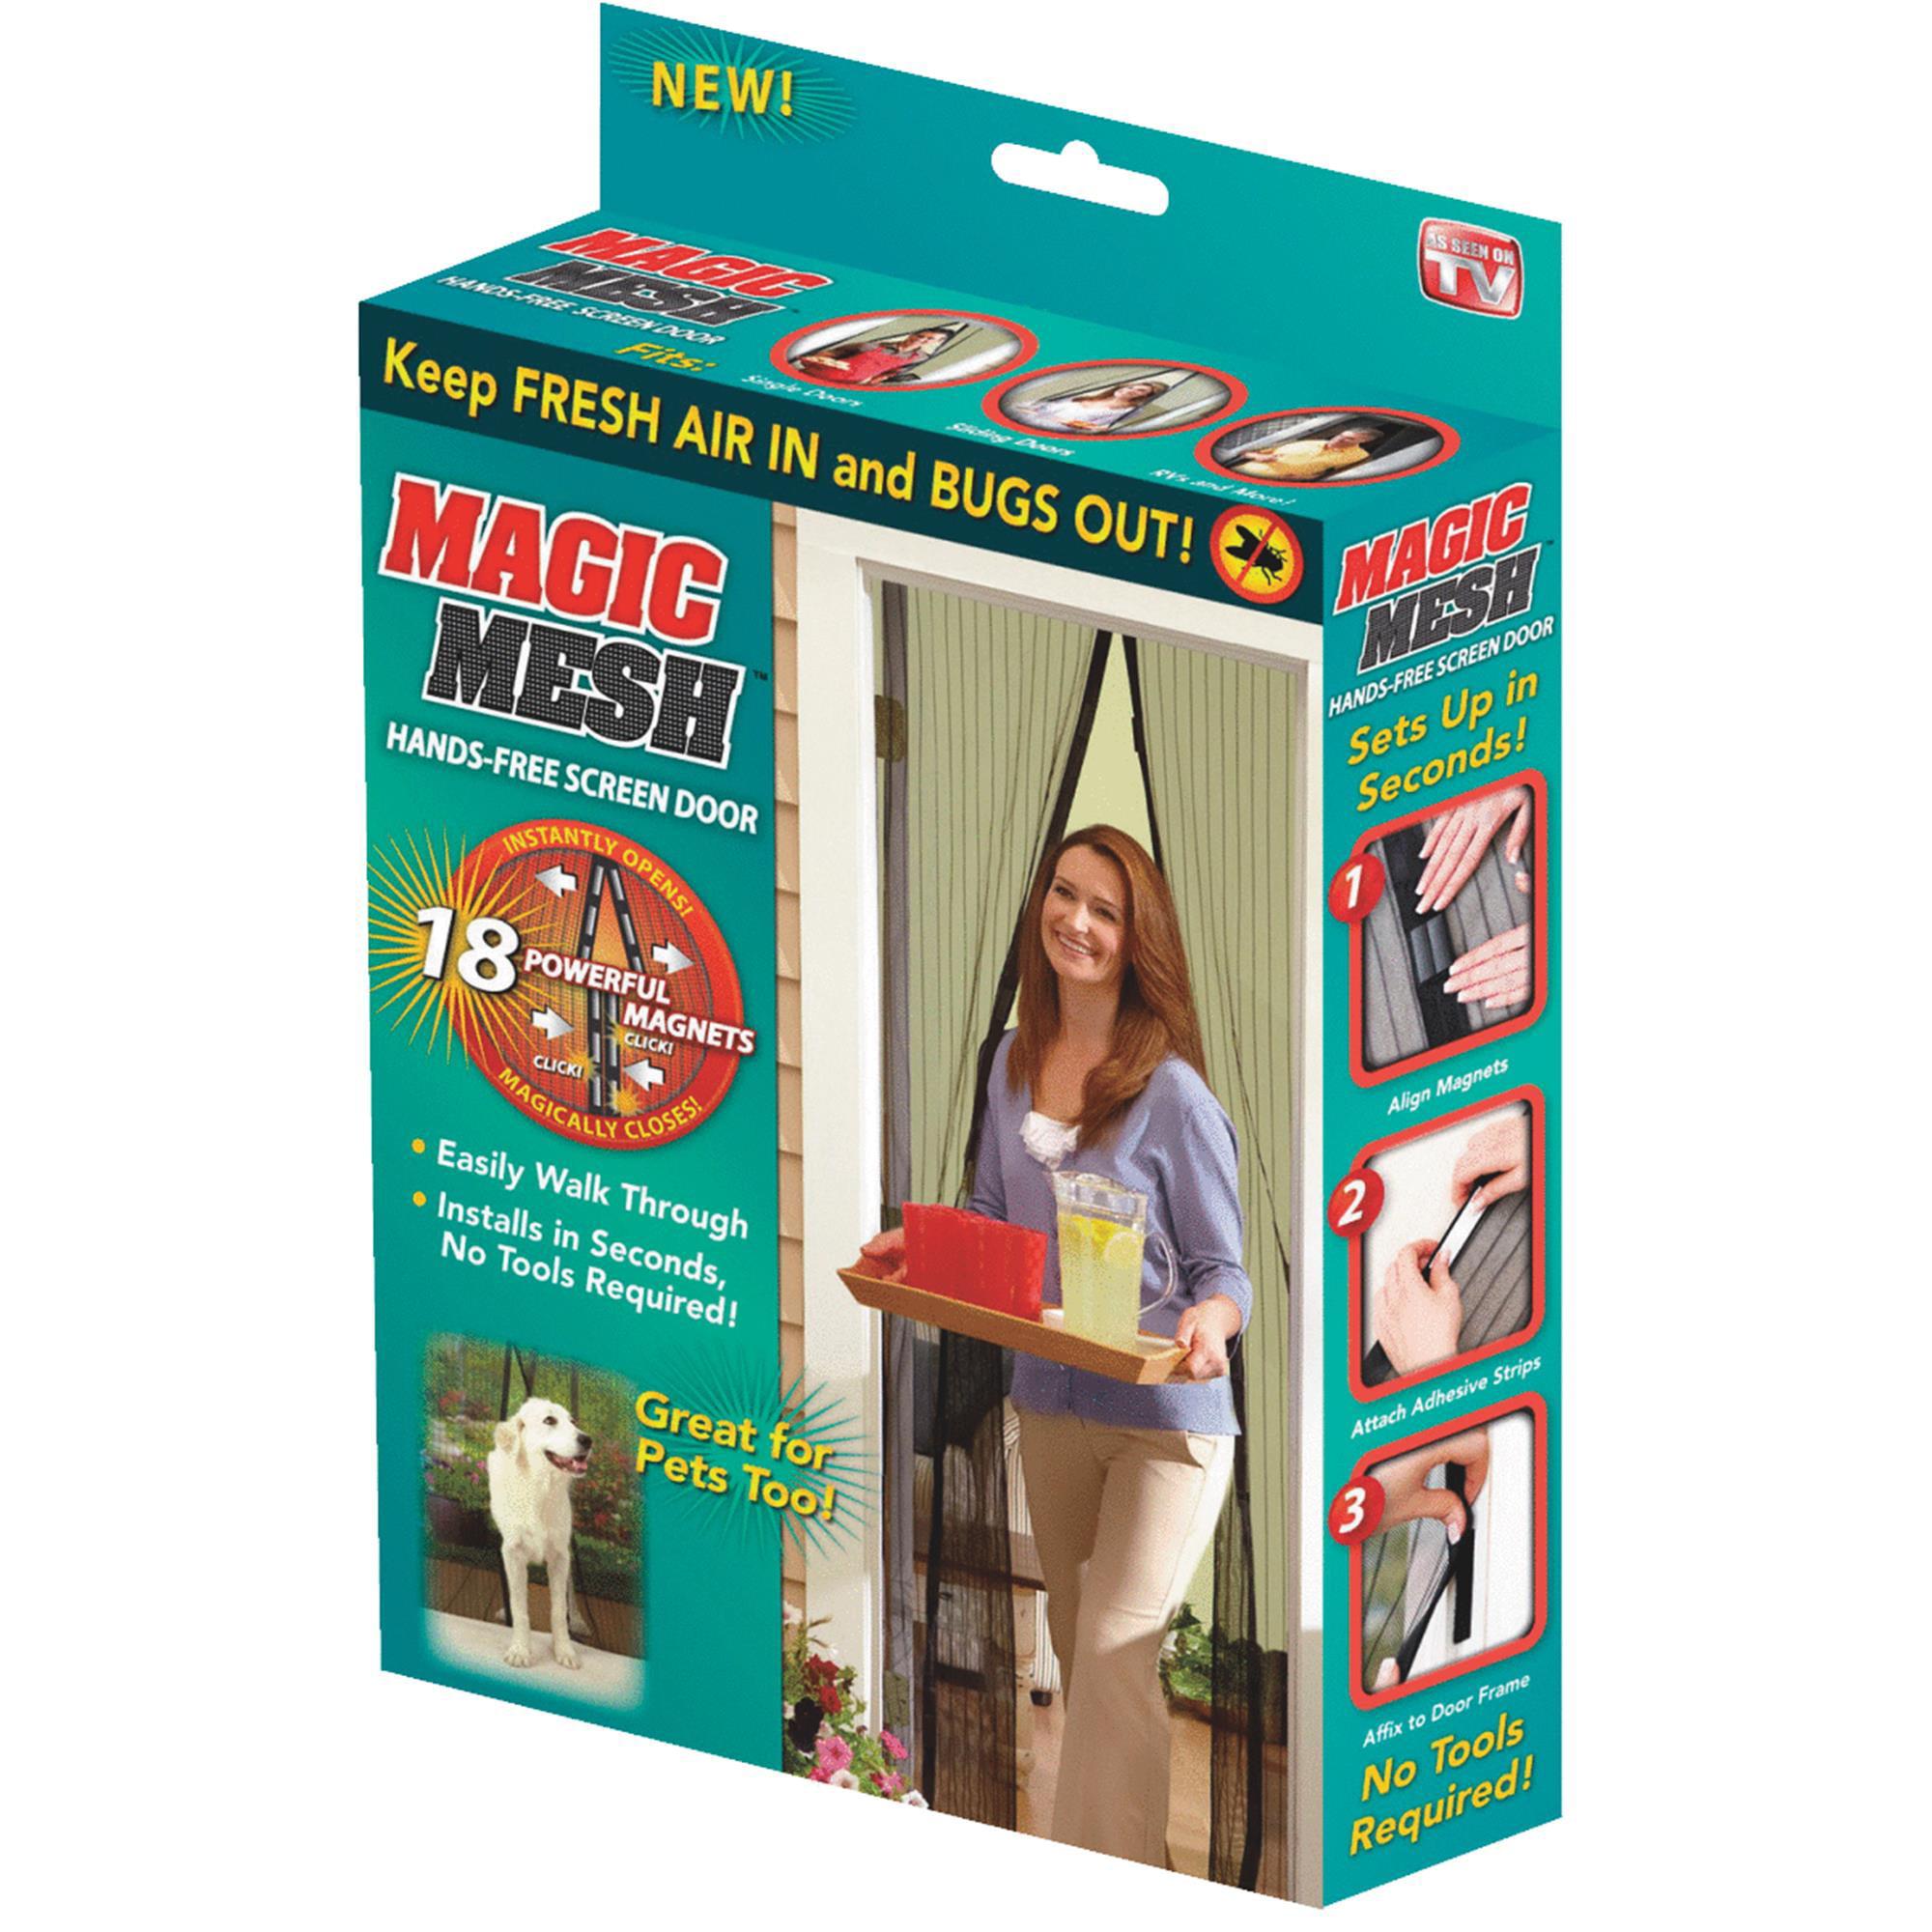 Magic Mesh Magnetic Hands Free Screen Door Cover As Seen